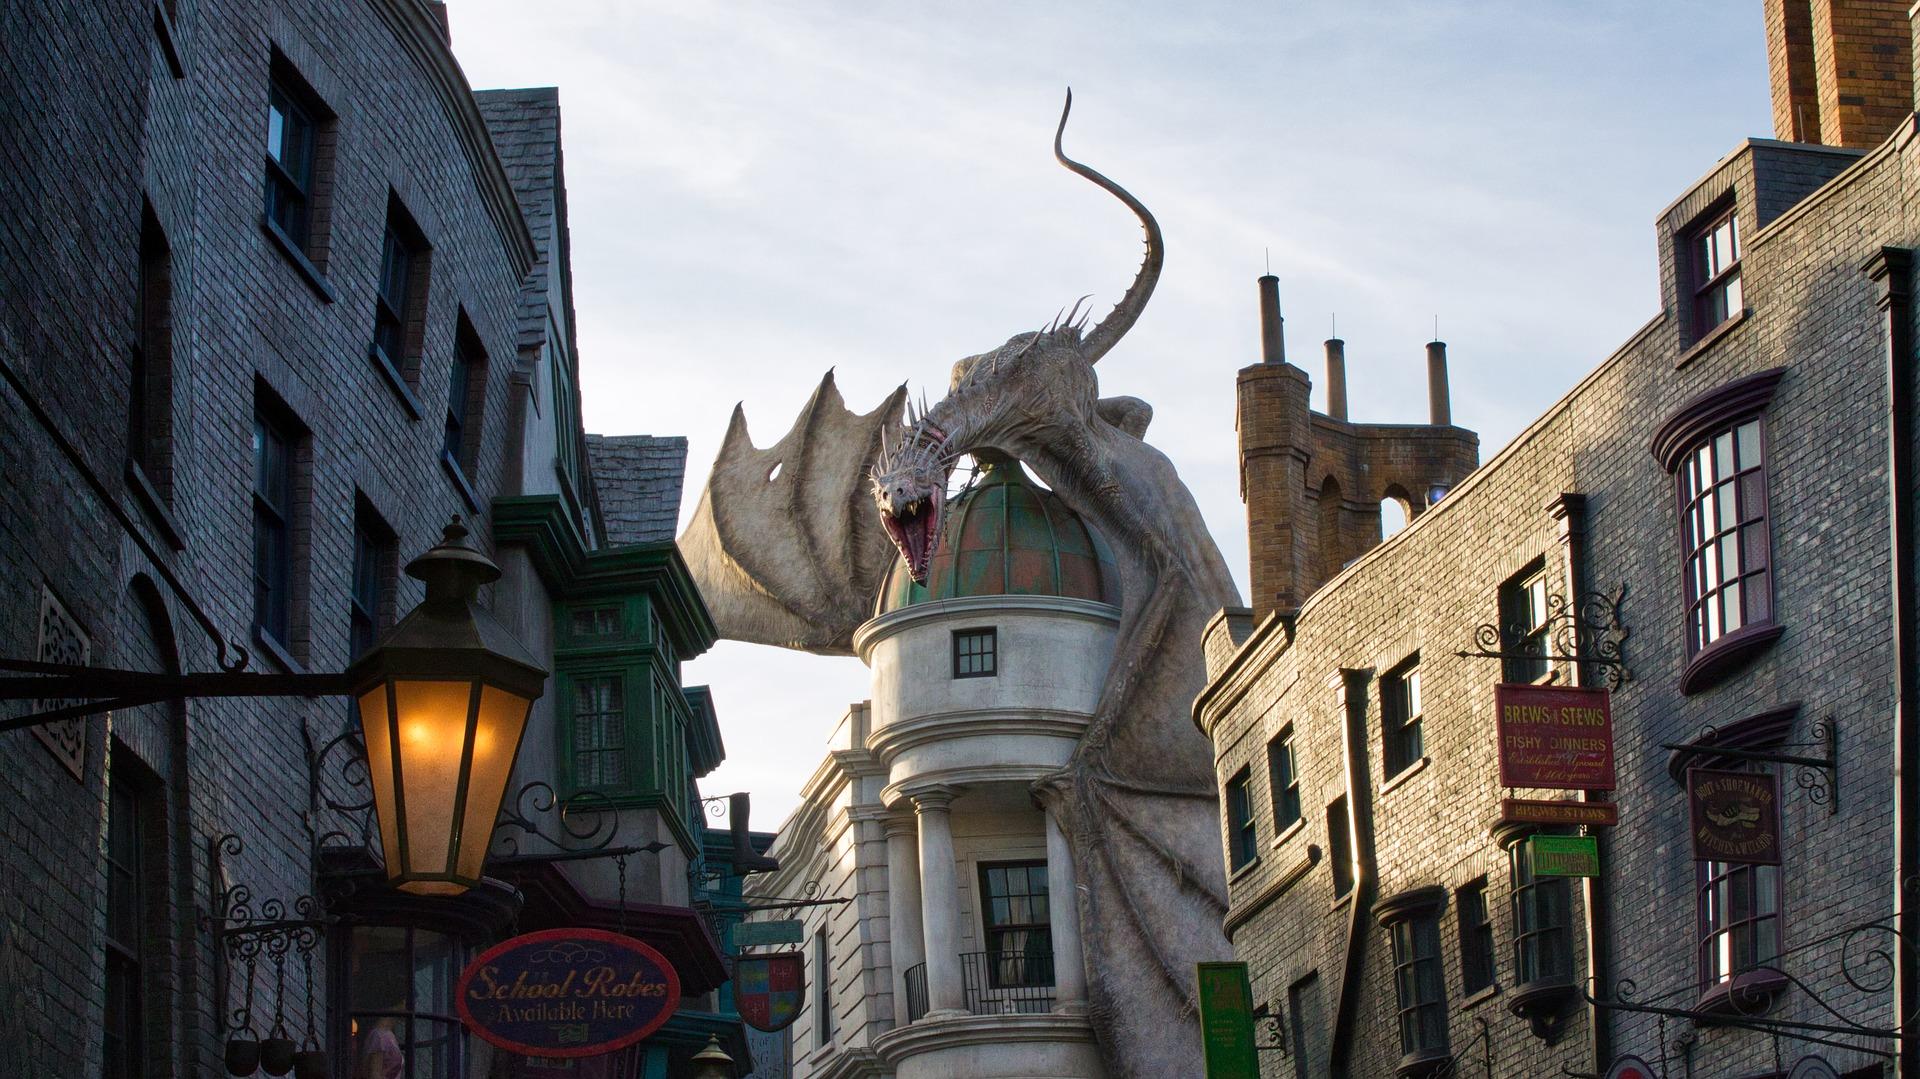 Universal Studios Reise The Making of Harry Potter Tour